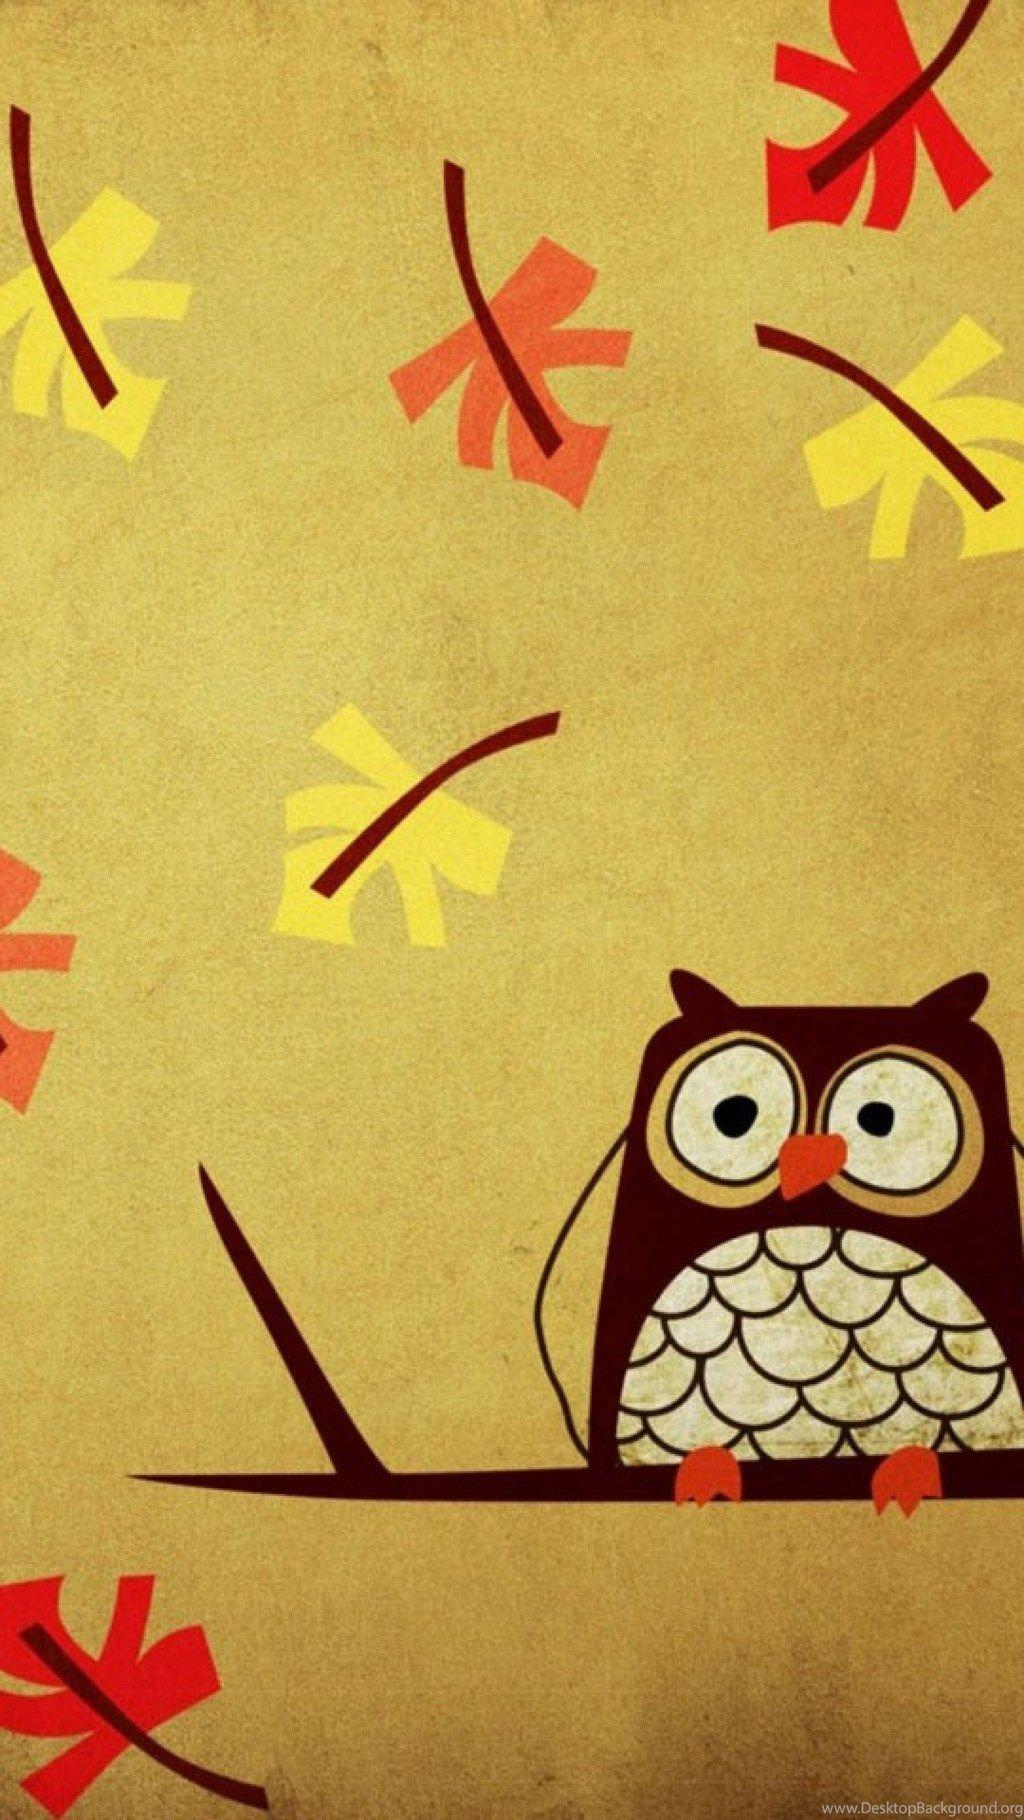 Cute Owl Wallpapers For Iphone Desktop Background Jpg 1024x1820 Girly Wallpaper